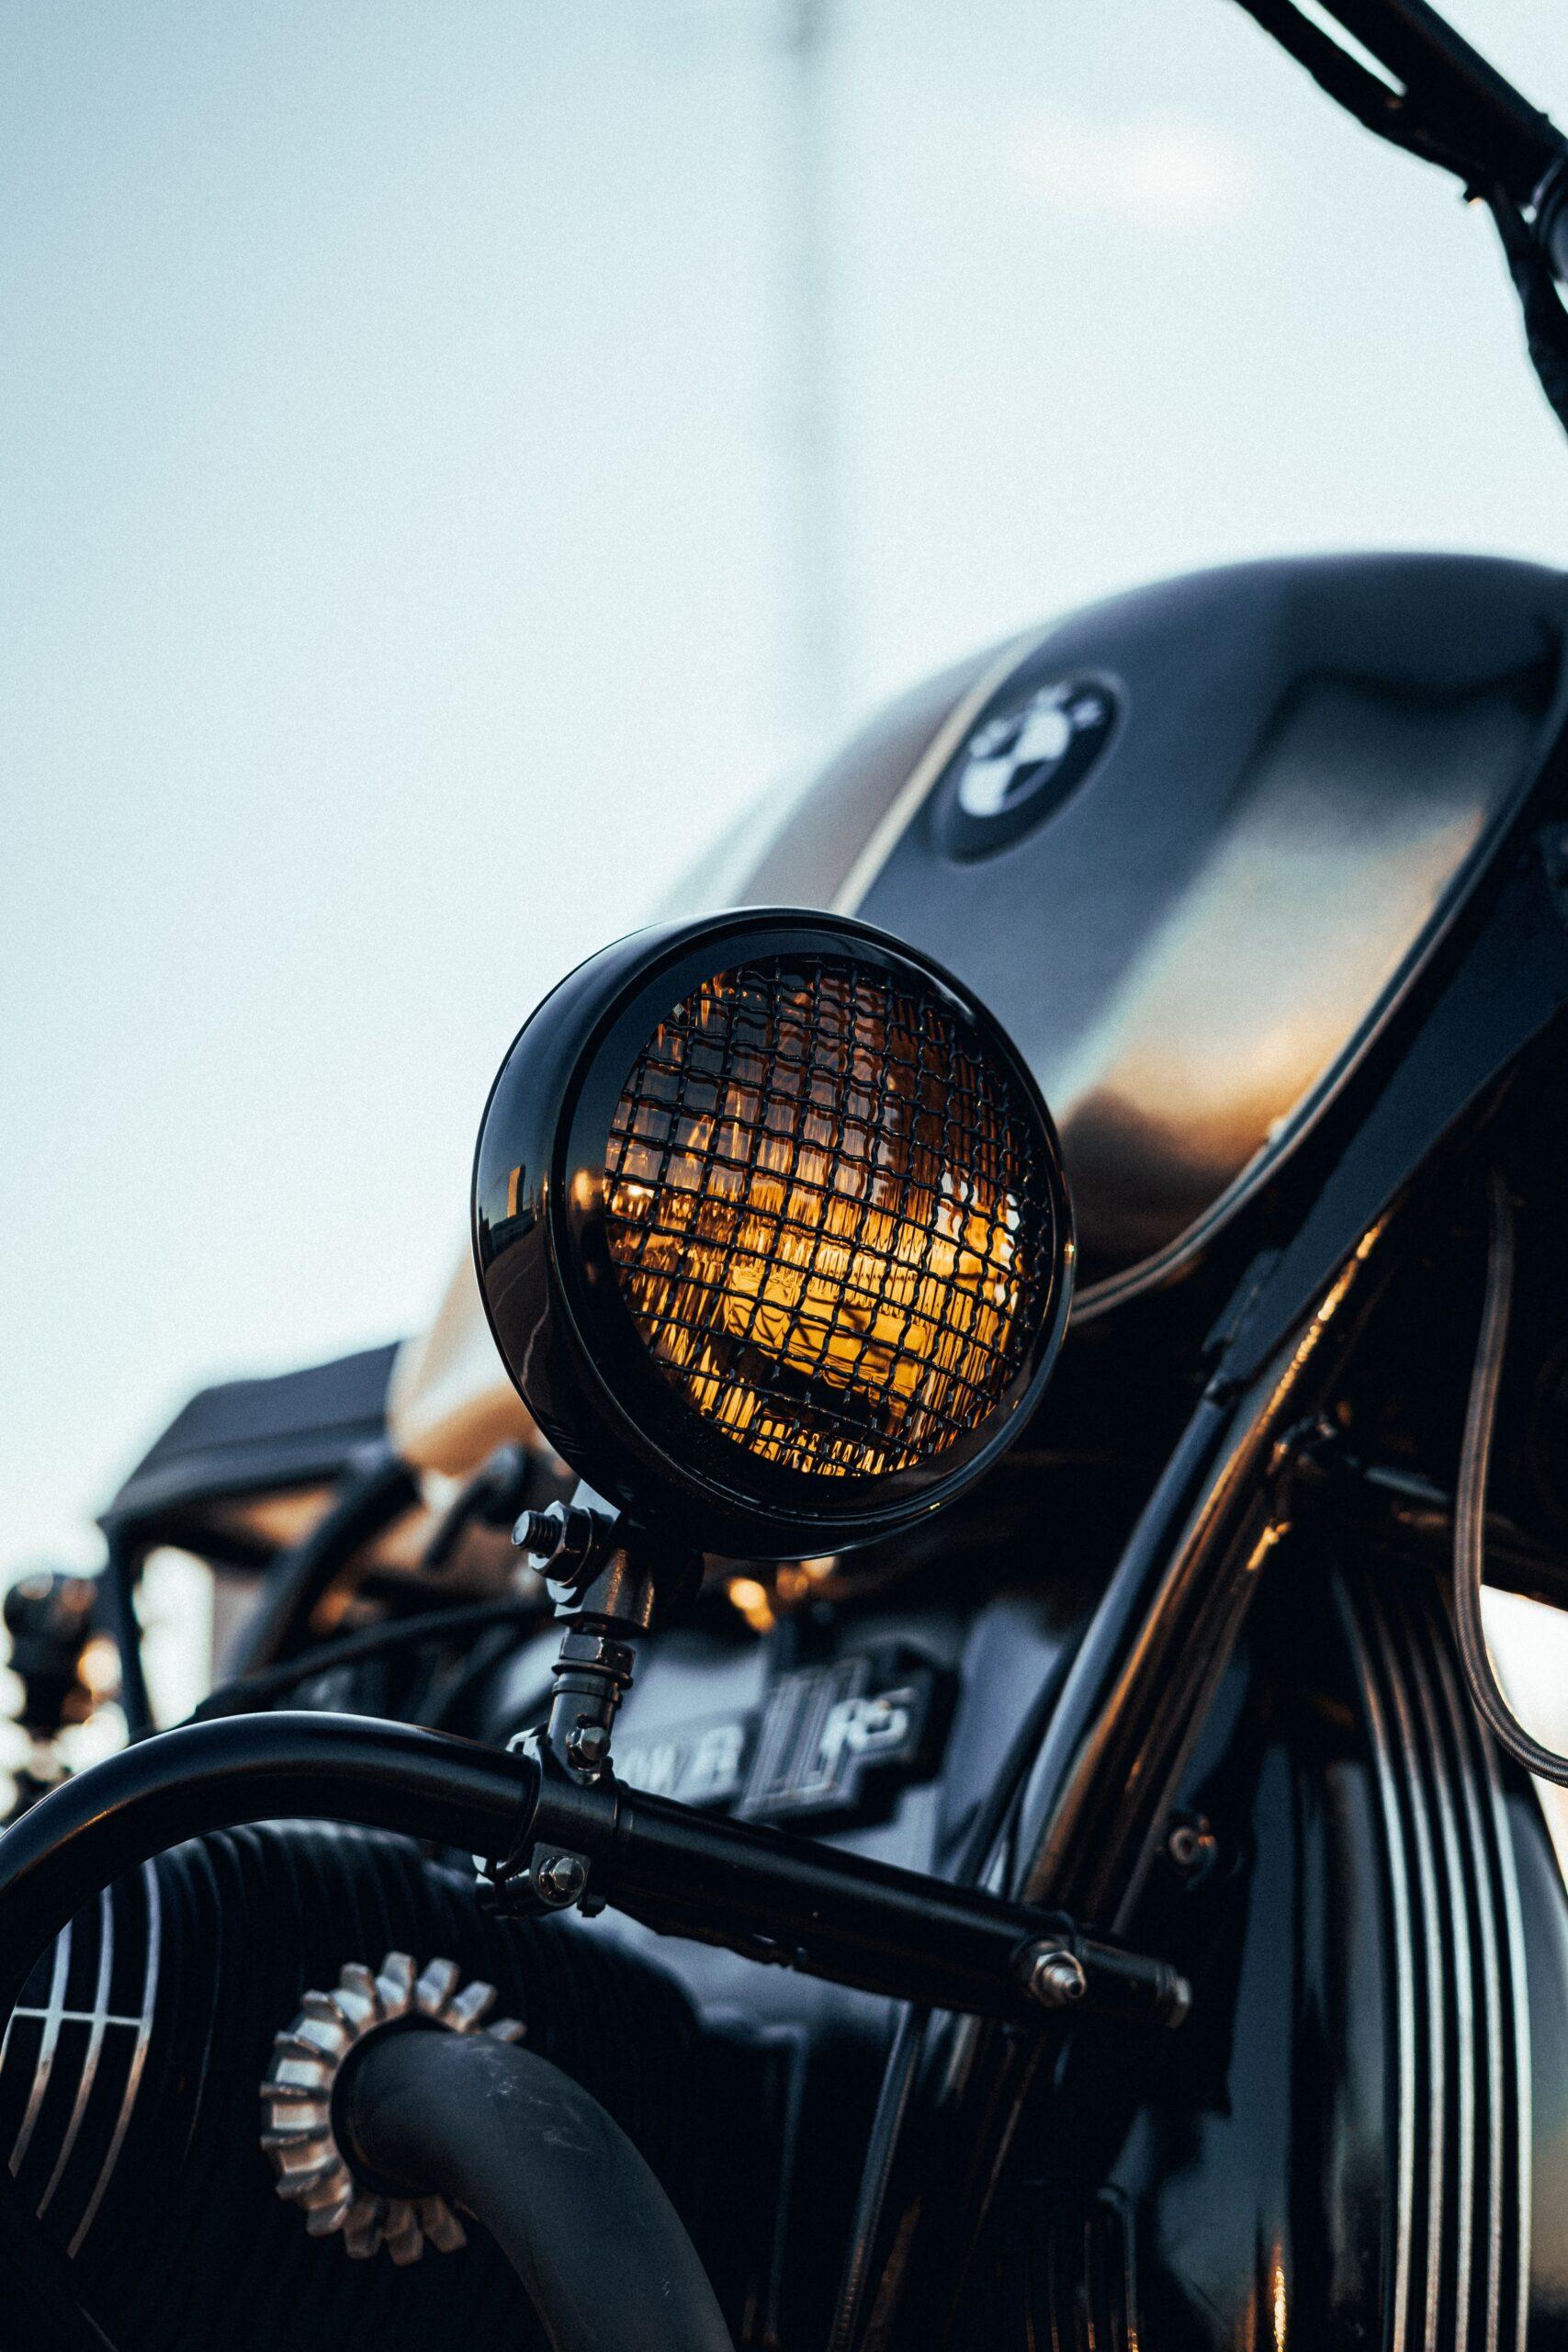 Motorcycle Radiator Repairs - BMW Bike - Plymouth Radiators